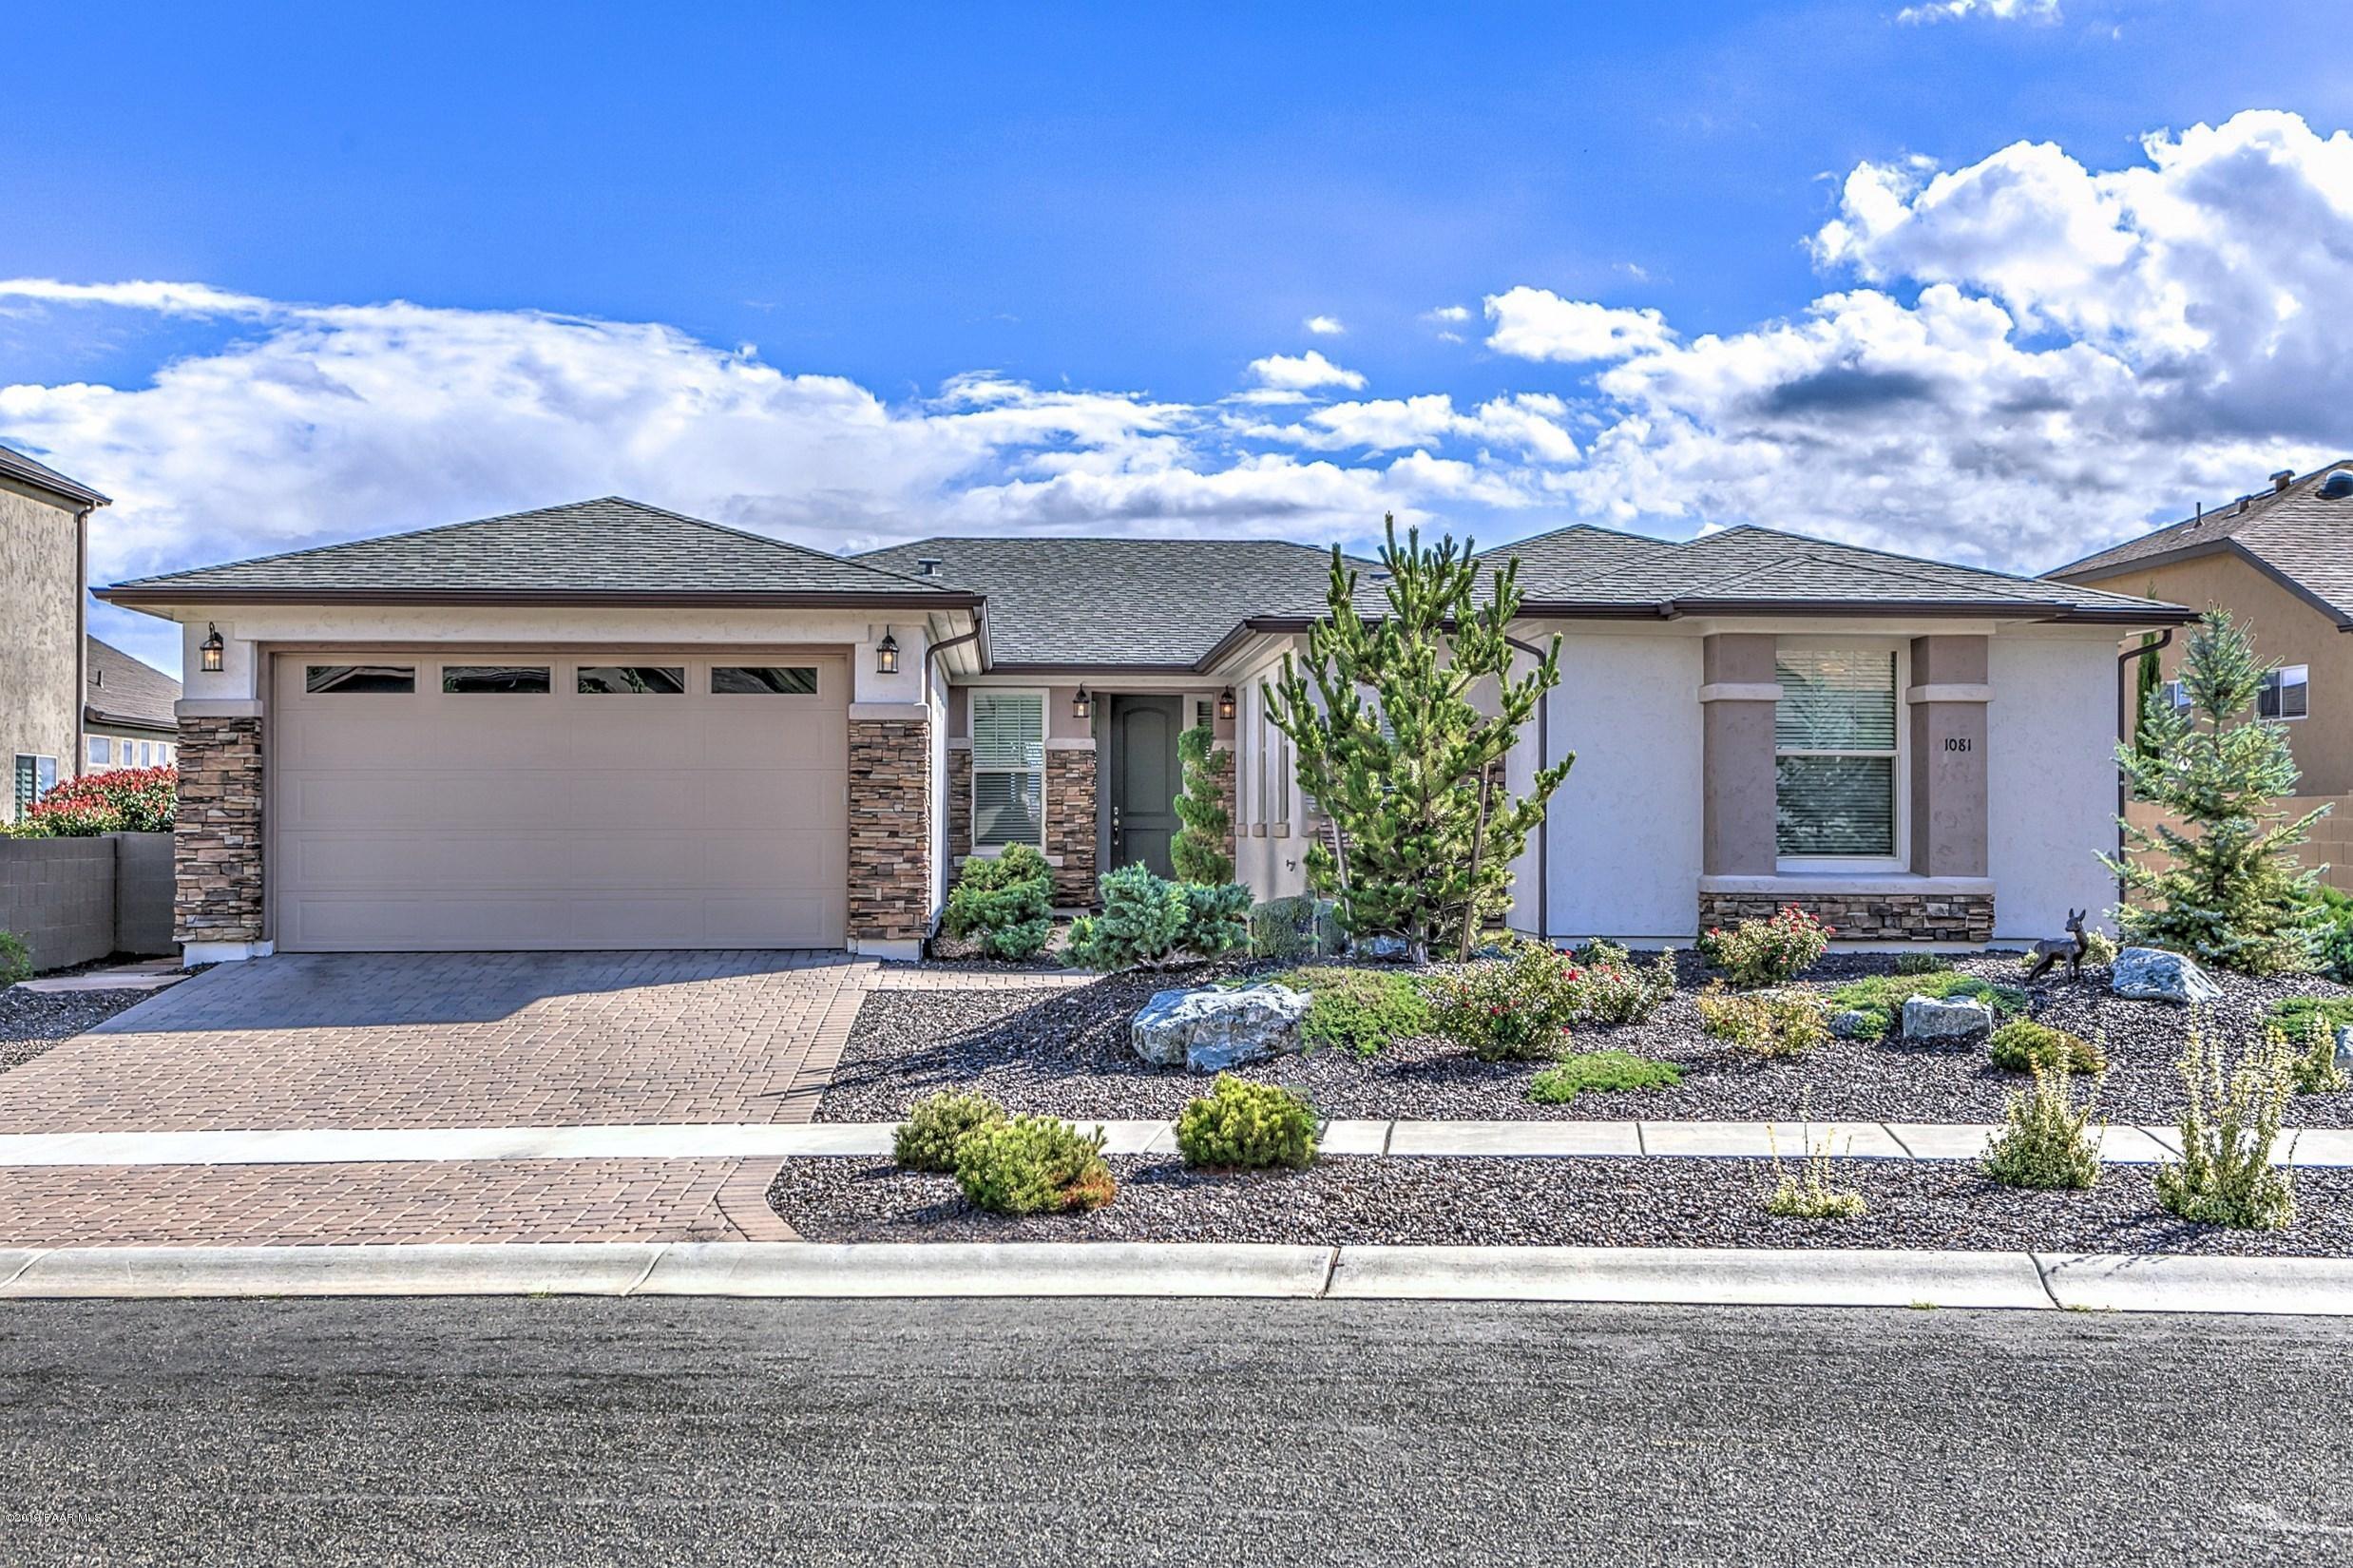 Photo of 1081 Wide Open, Prescott Valley, AZ 86314